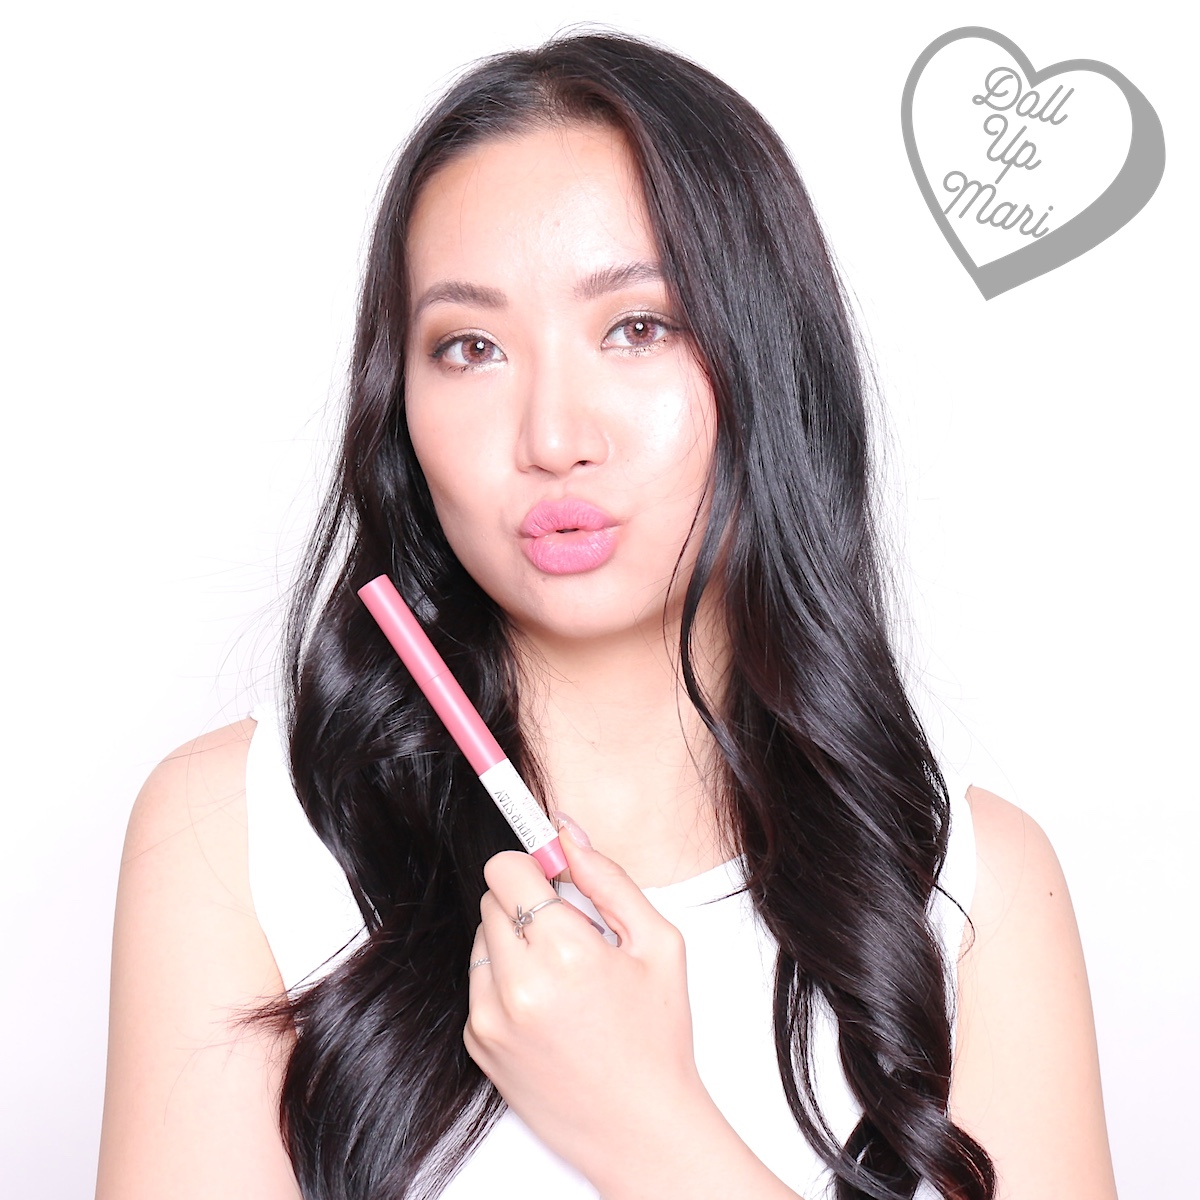 dollupmari wearing 90 Keep It Fun shade of Maybelline Superstay Ink Crayon 8HR Longwear Matte Lipstick